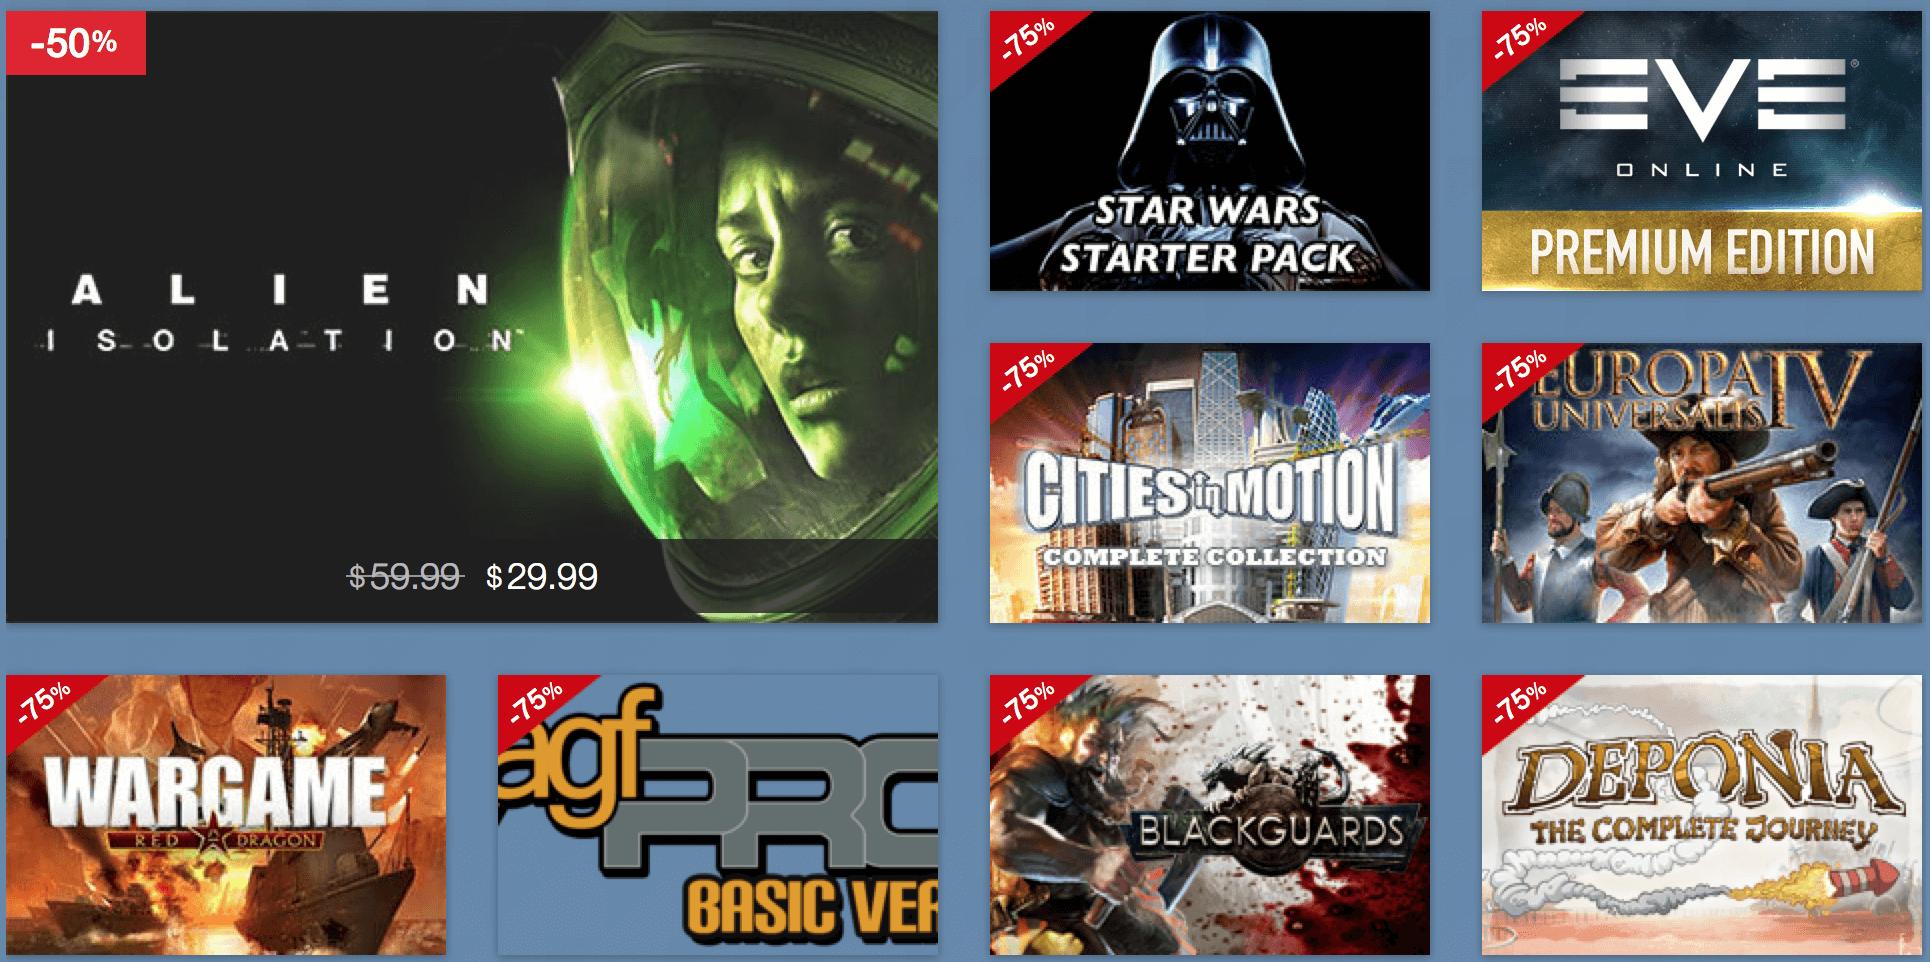 Einige Angebote im Holiday Sale 2015 vom MacGameStore (Screenshot: macgamestore.com)